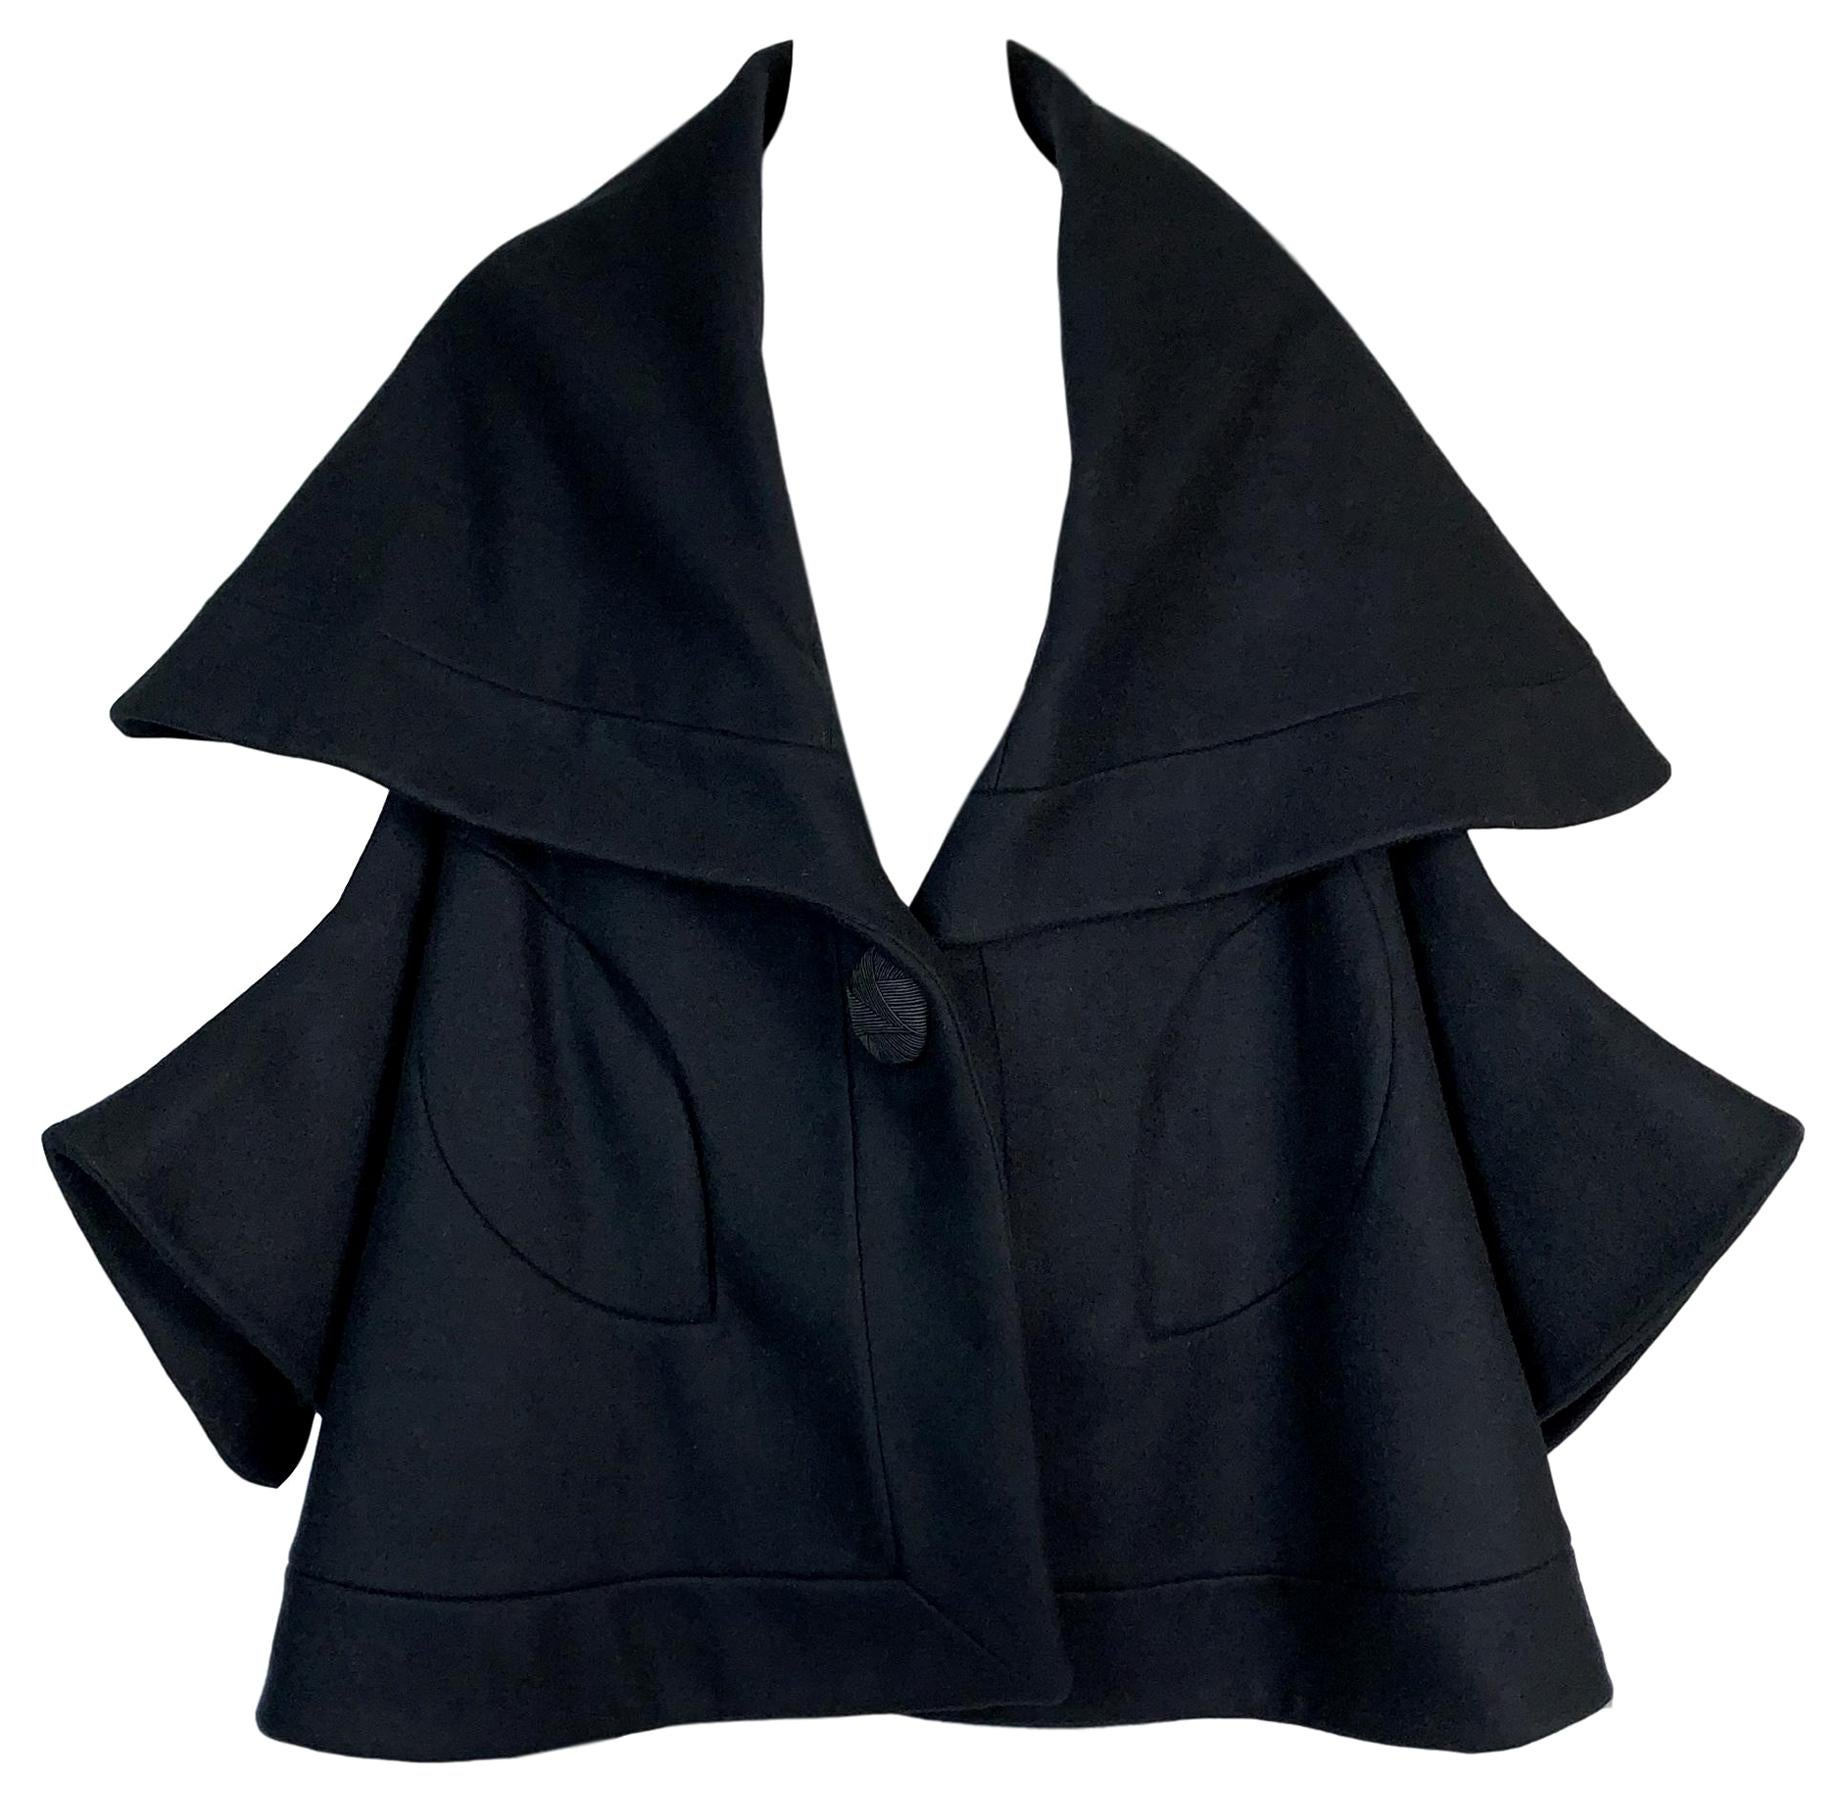 F/W 1995 John Galliano Runway Black Princess Coat Jacket